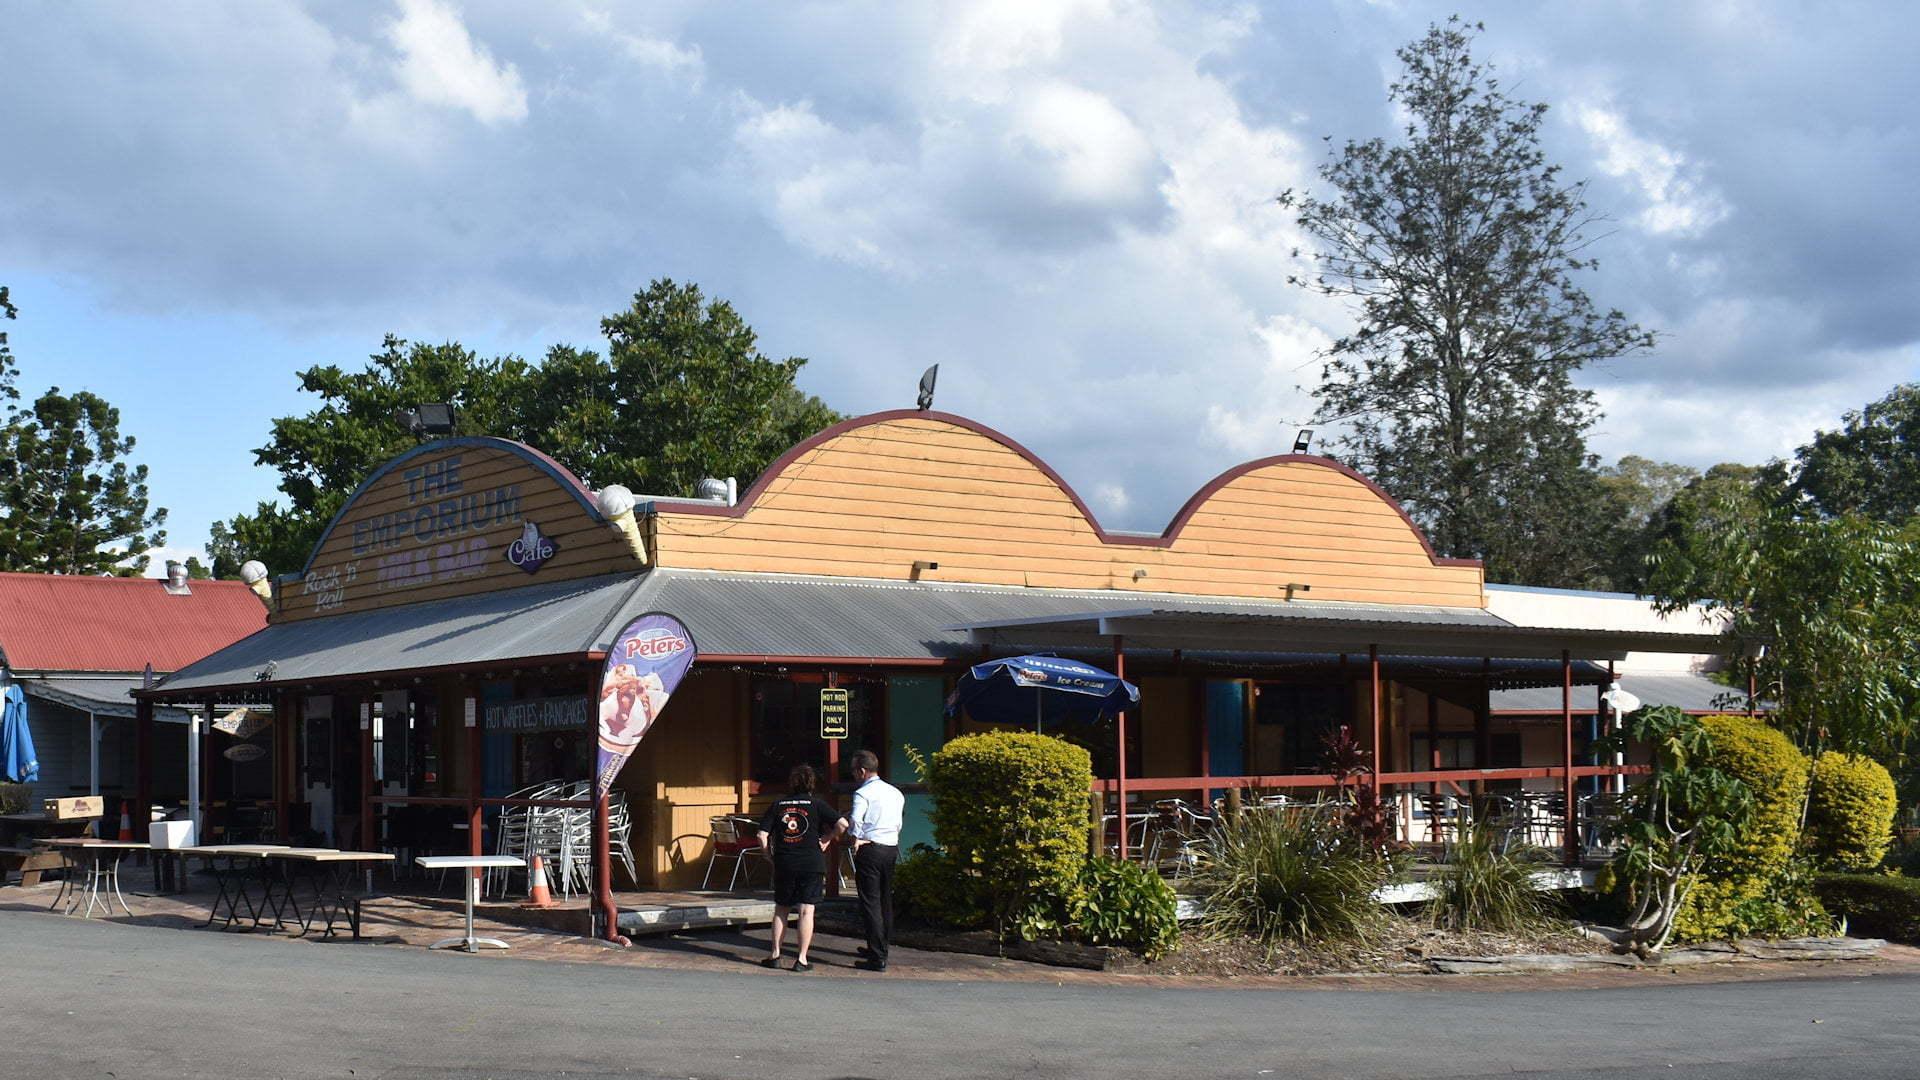 The Emporium Milk Bar at Old Petrie Town